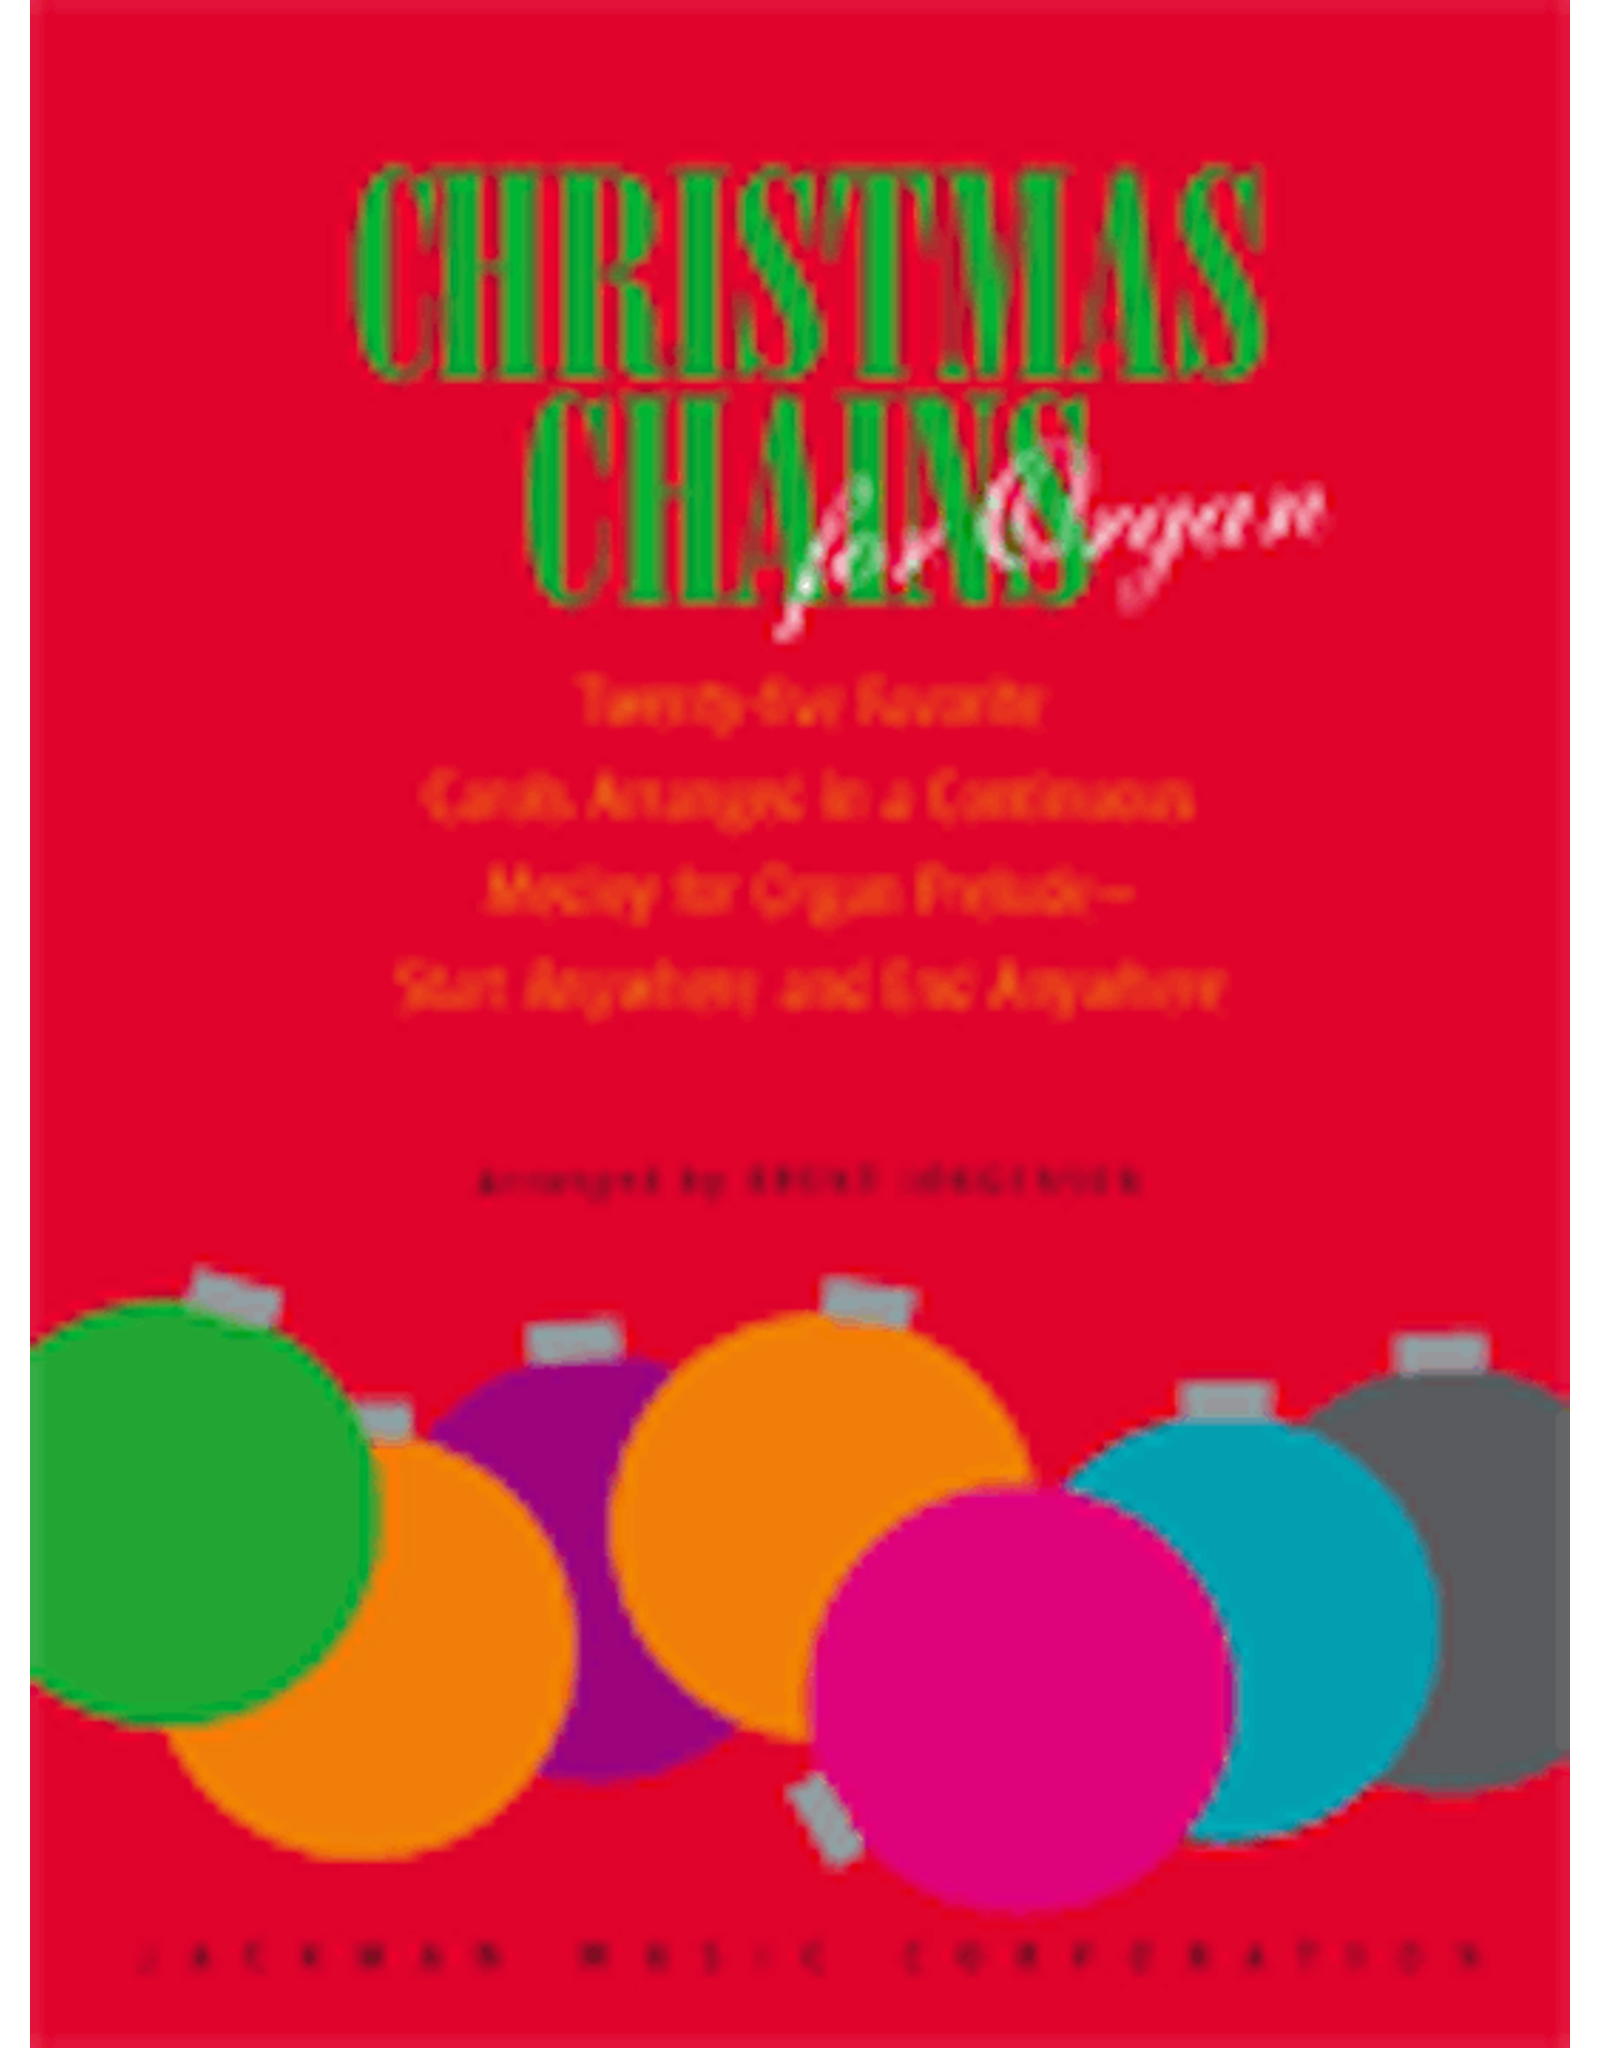 Jackman Music Christmas Chains for Organ arranged by Brent Jorgensen.